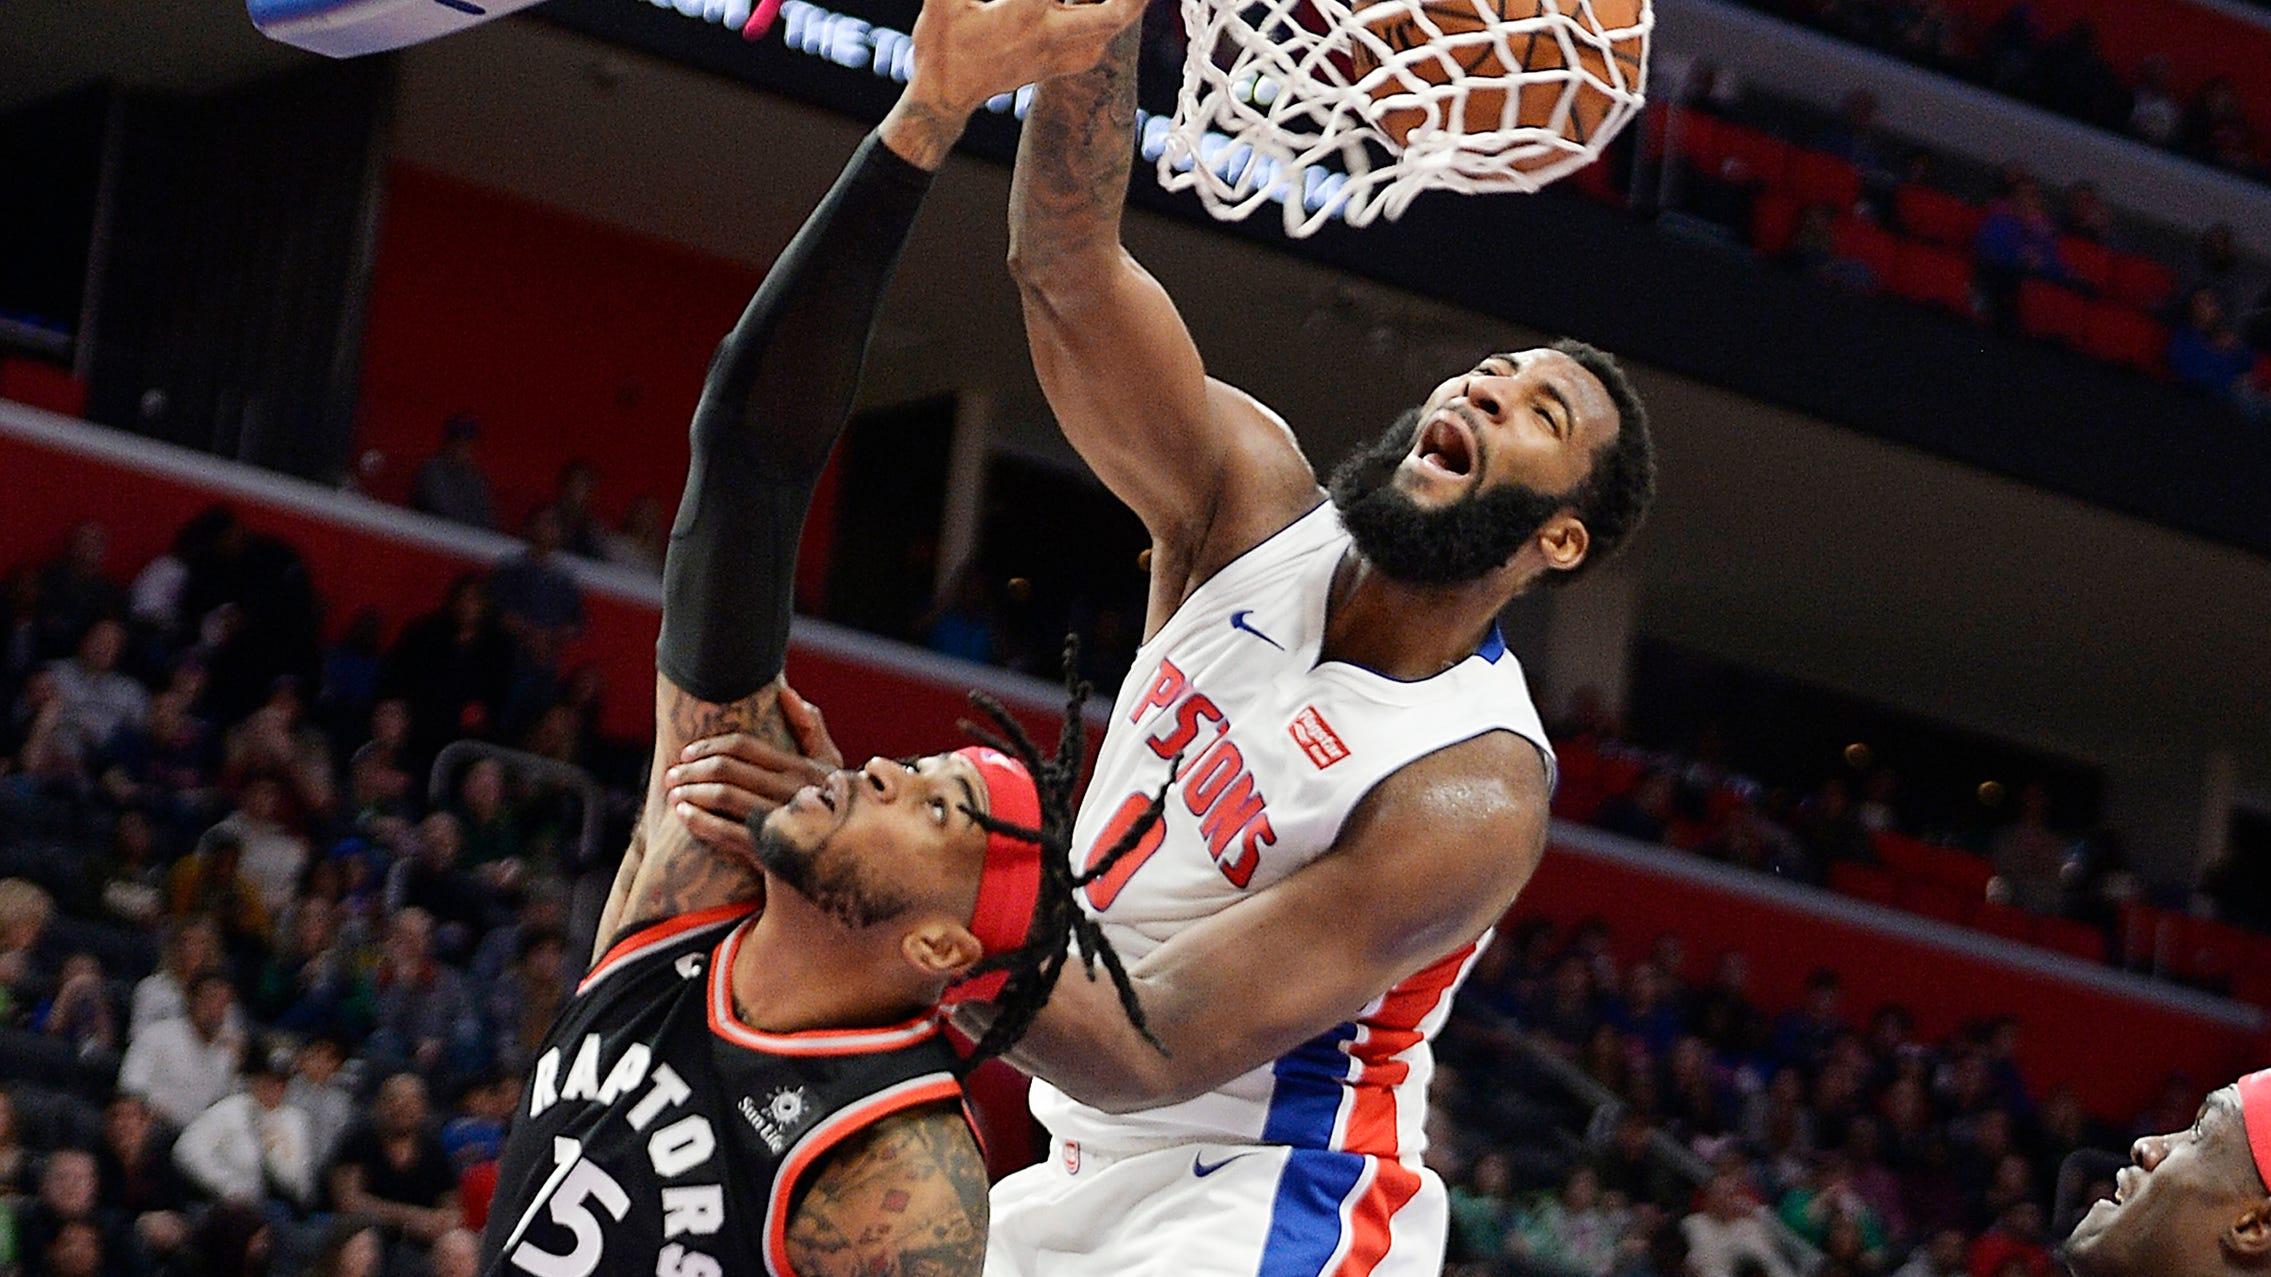 Pistons mailbag: Dwane Casey's Toronto ties make Raptors intriguing playoff foe